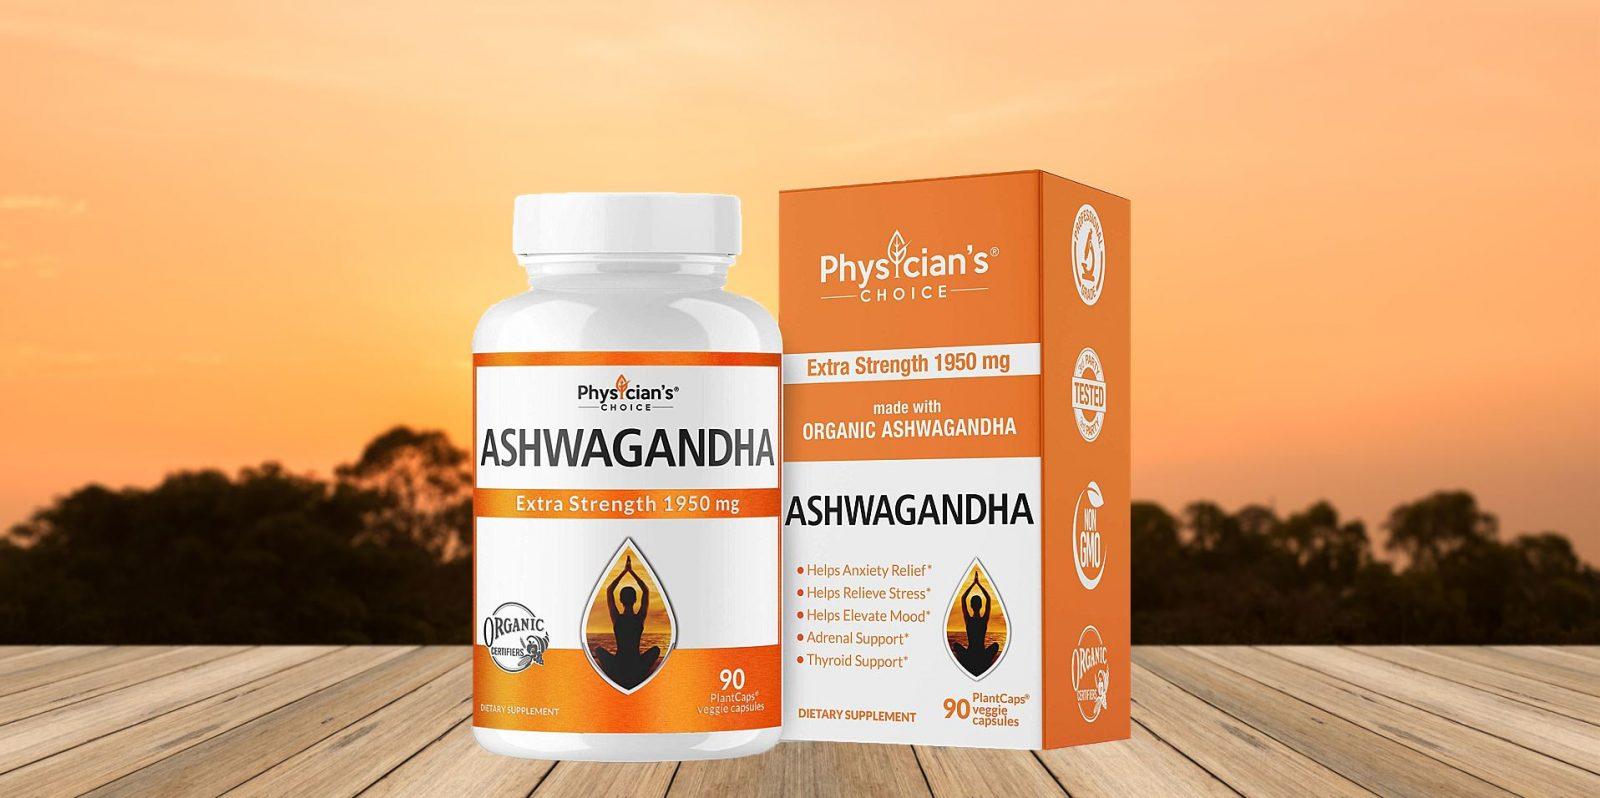 Physician's Choice Ashwagandha